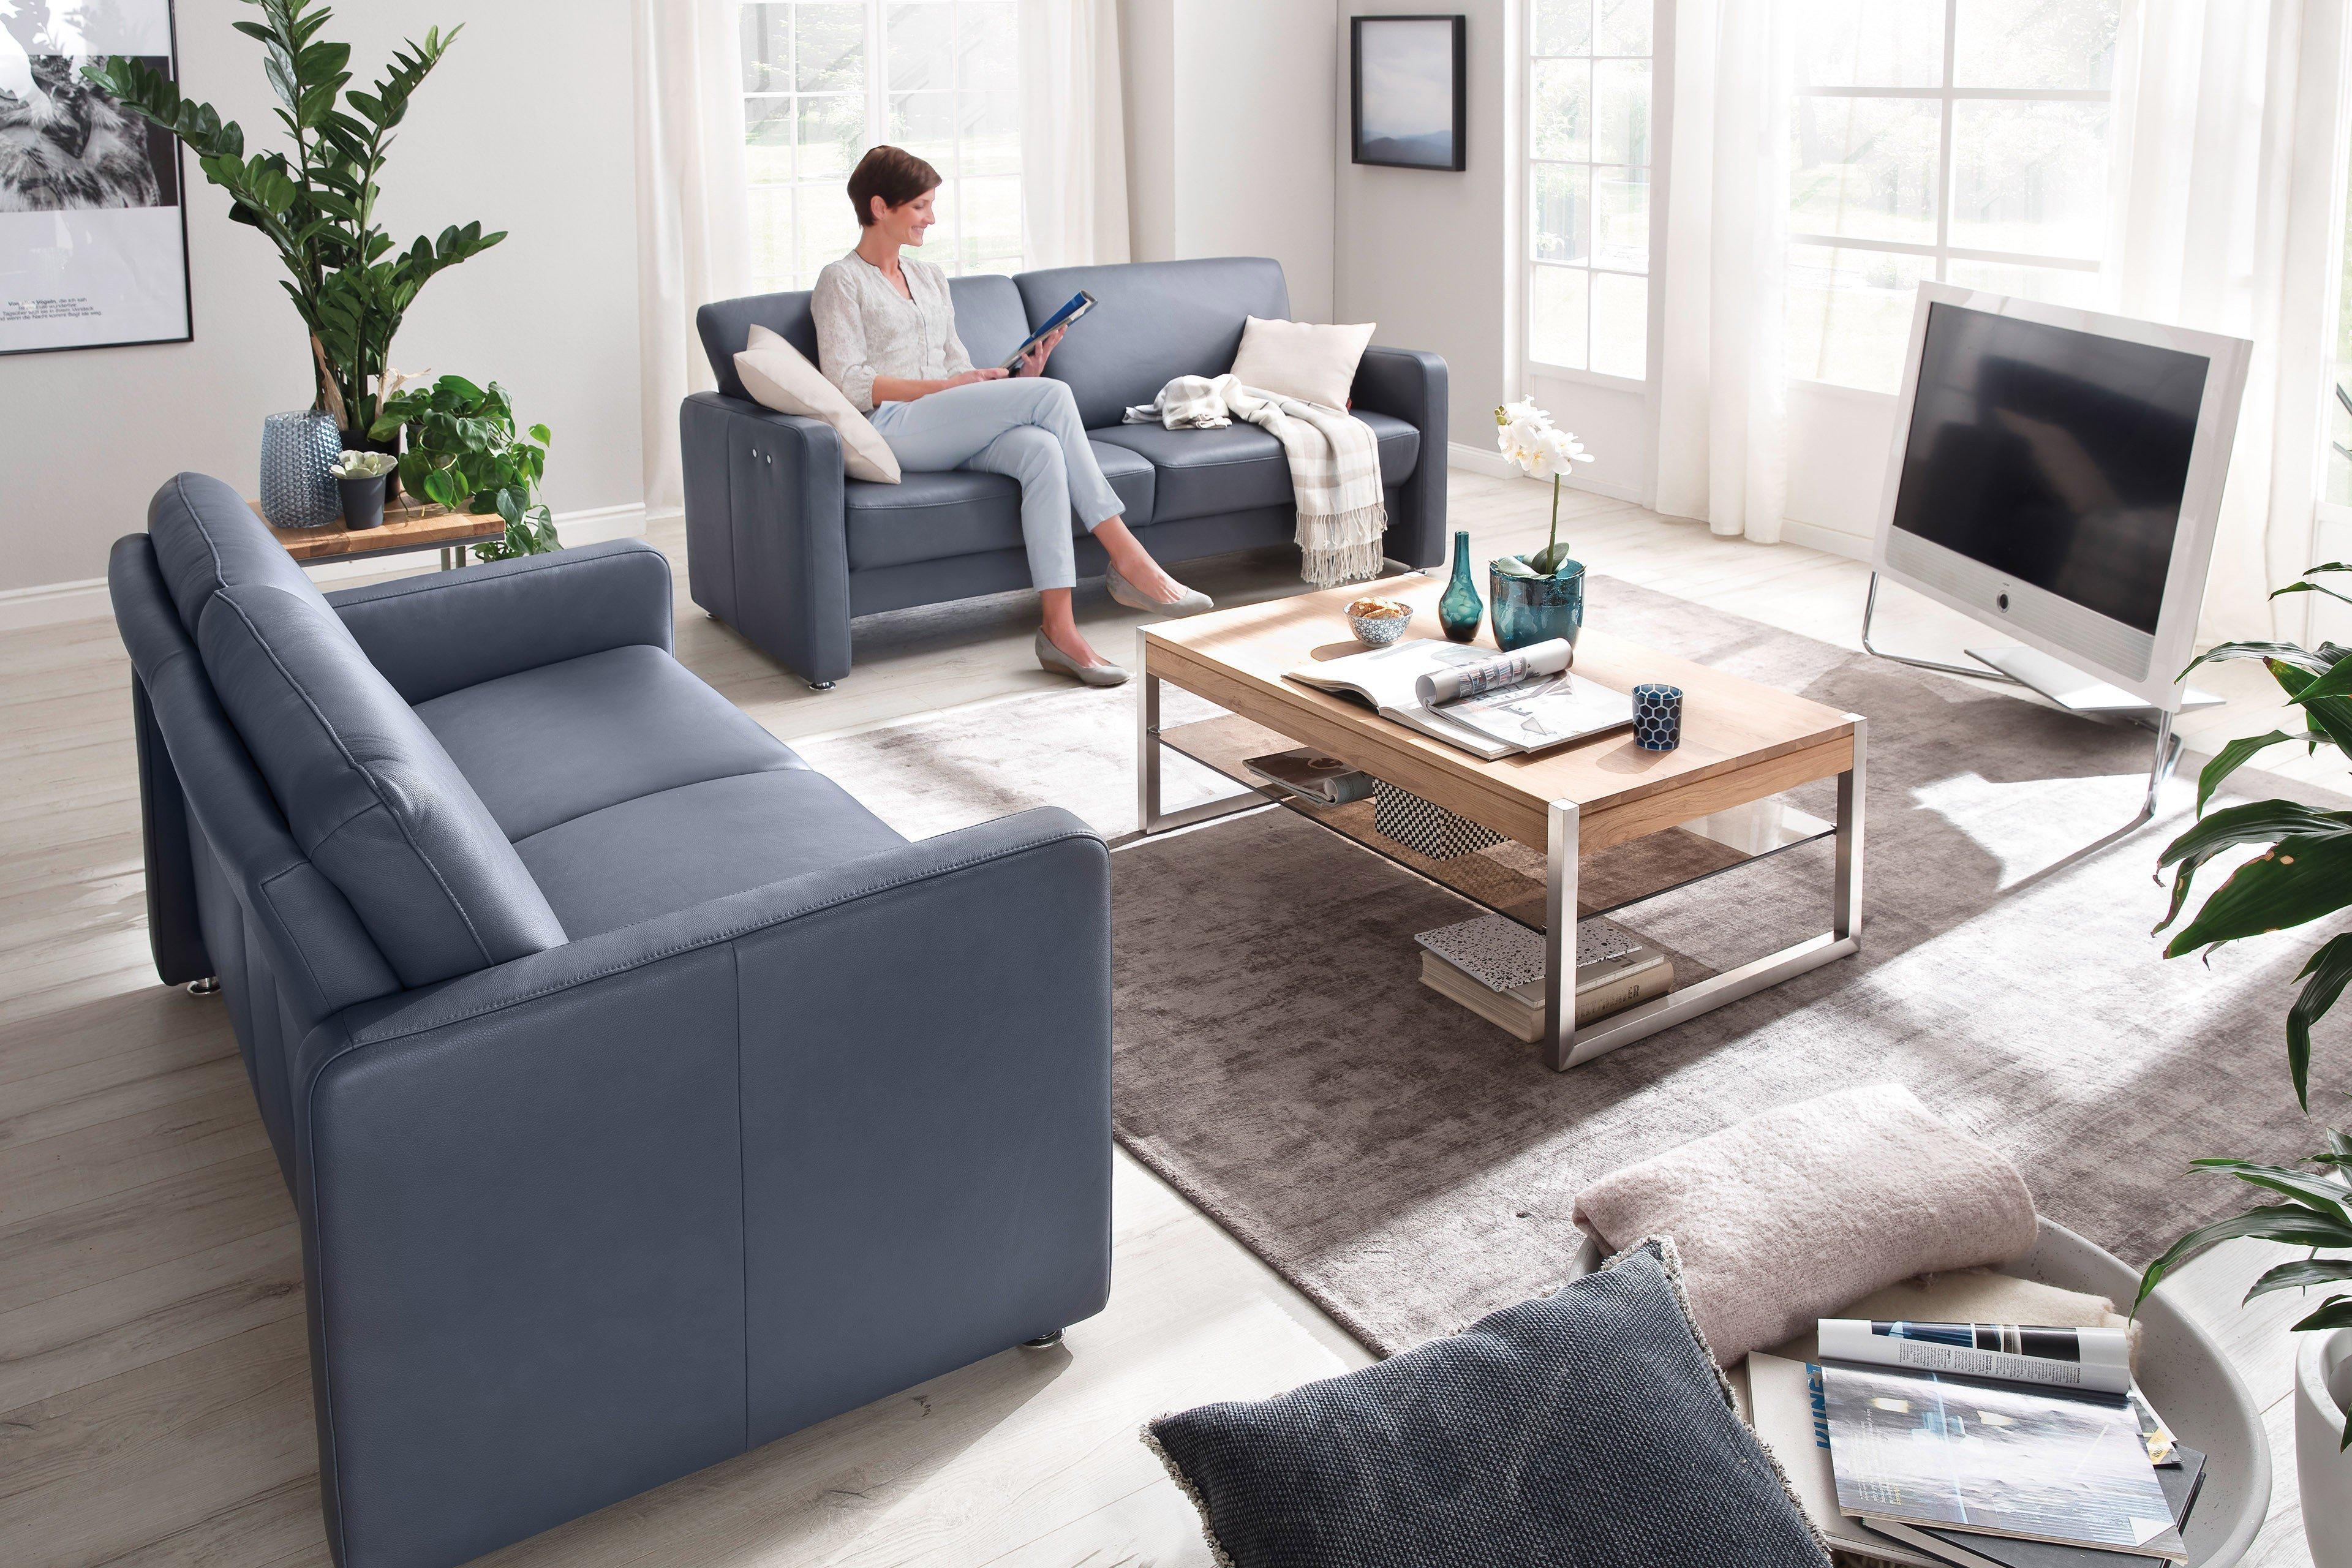 Casada Chronos Sofagruppe blau | Möbel Letz - Ihr Online-Shop